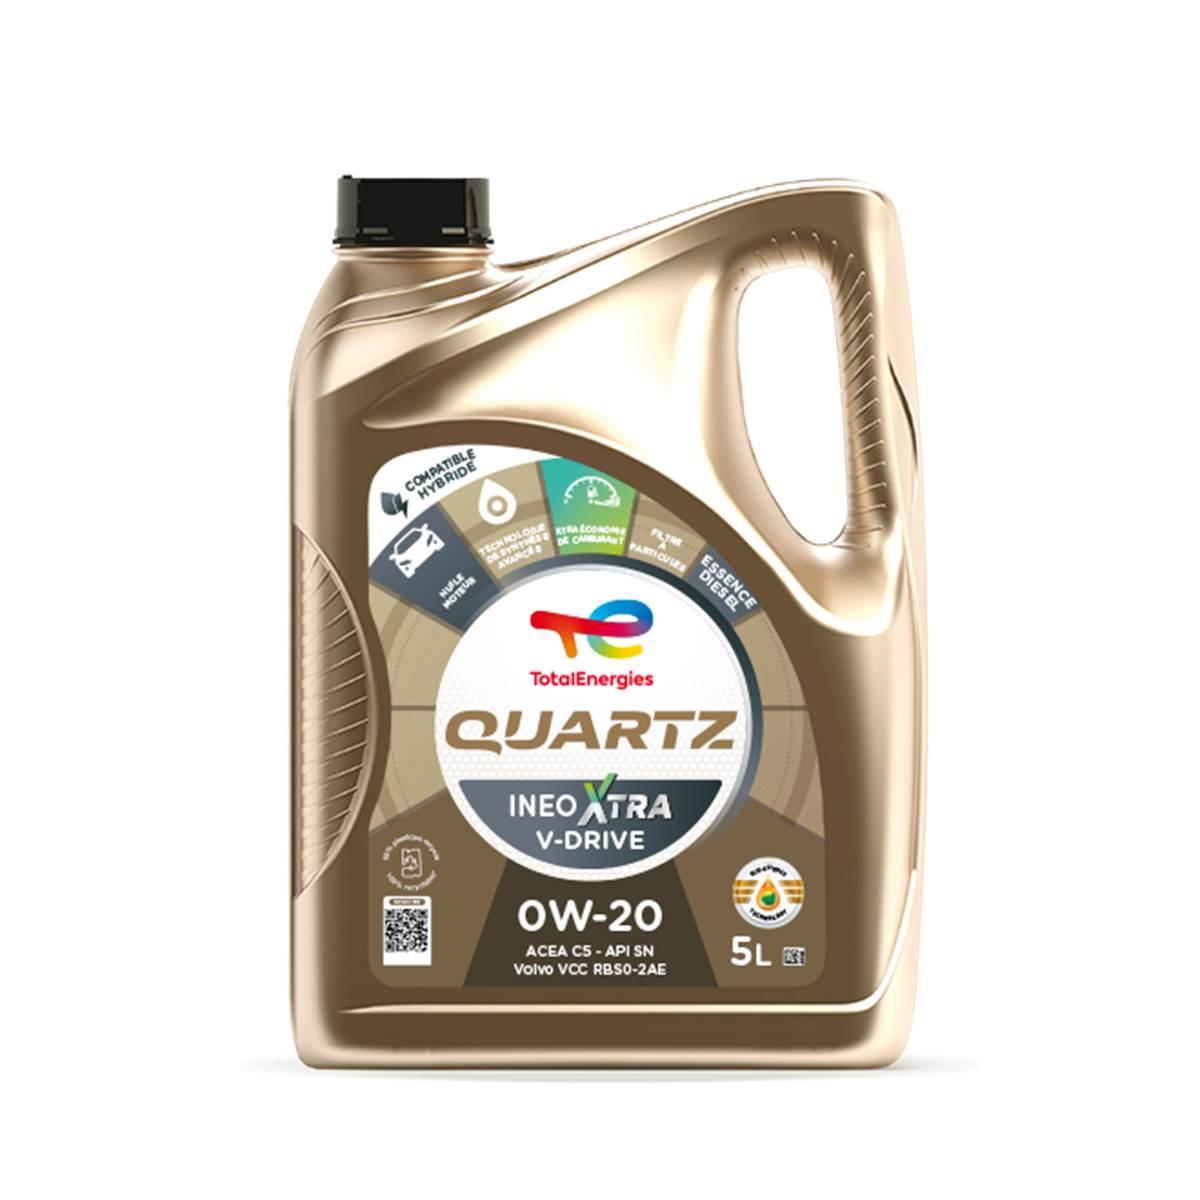 Huile moteur TOTAL Quartz Ineo Xtra V-Drive Essence/Diesel 0W20 5L